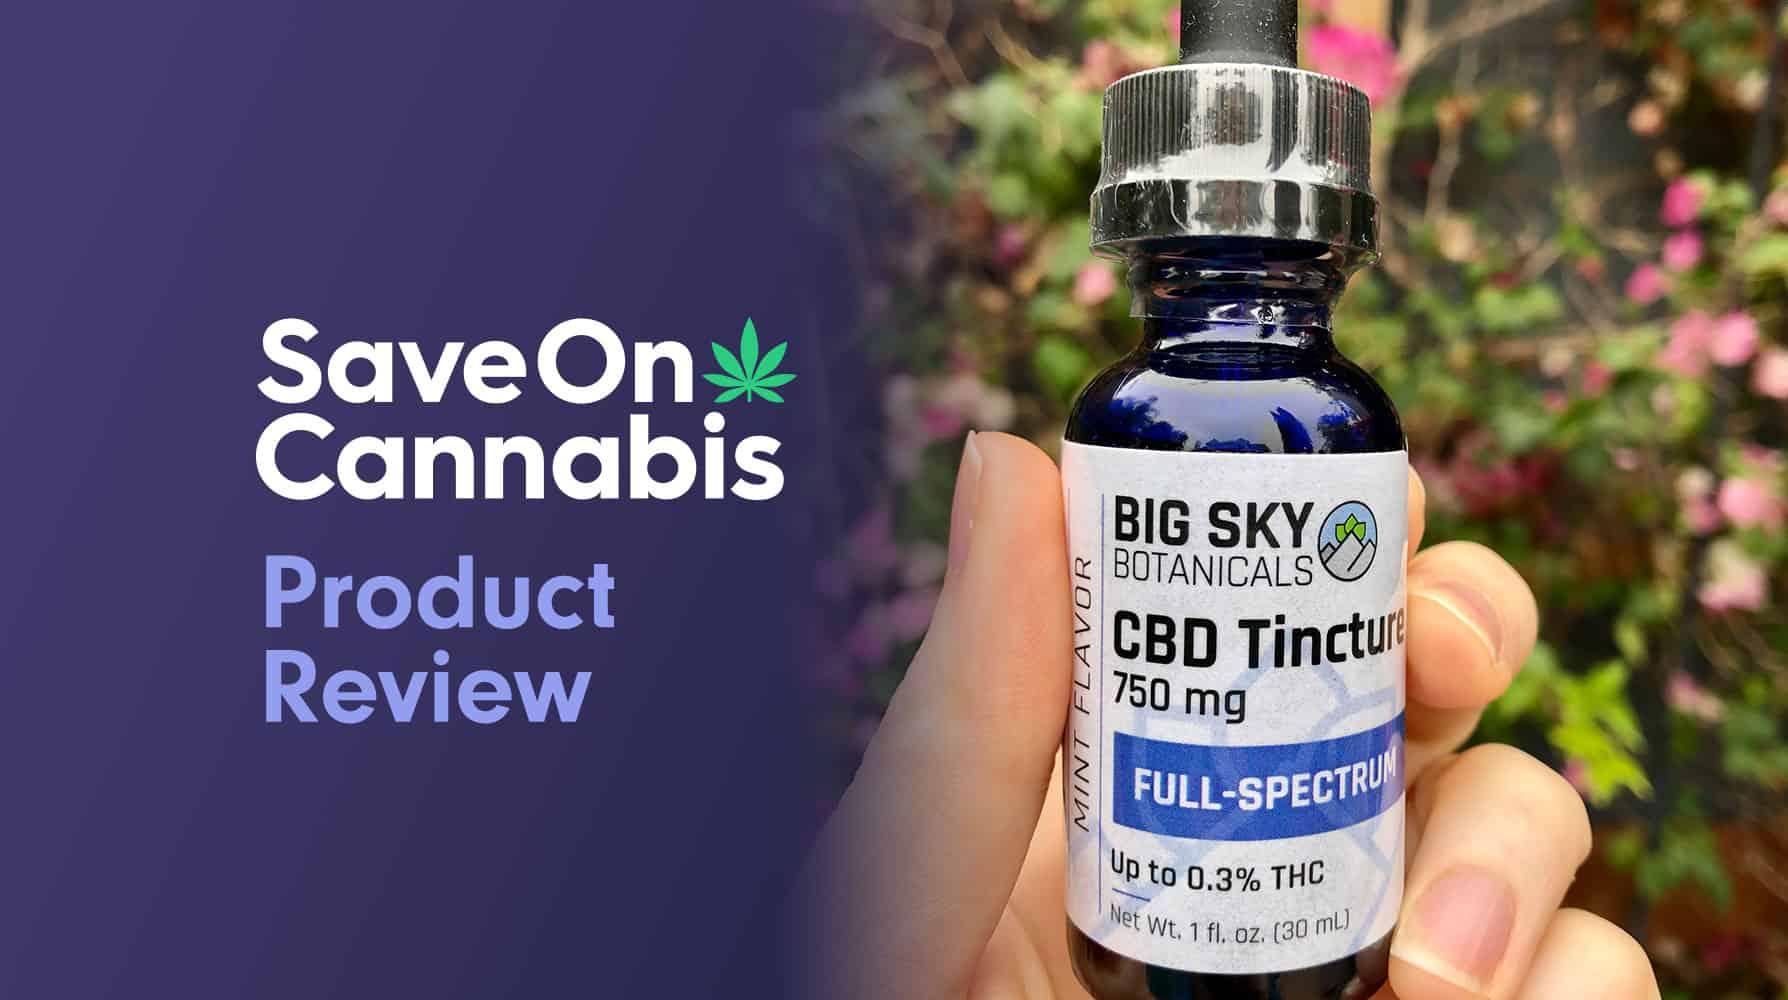 big sky botanicals full spectrum CBD review save on cannabis Website